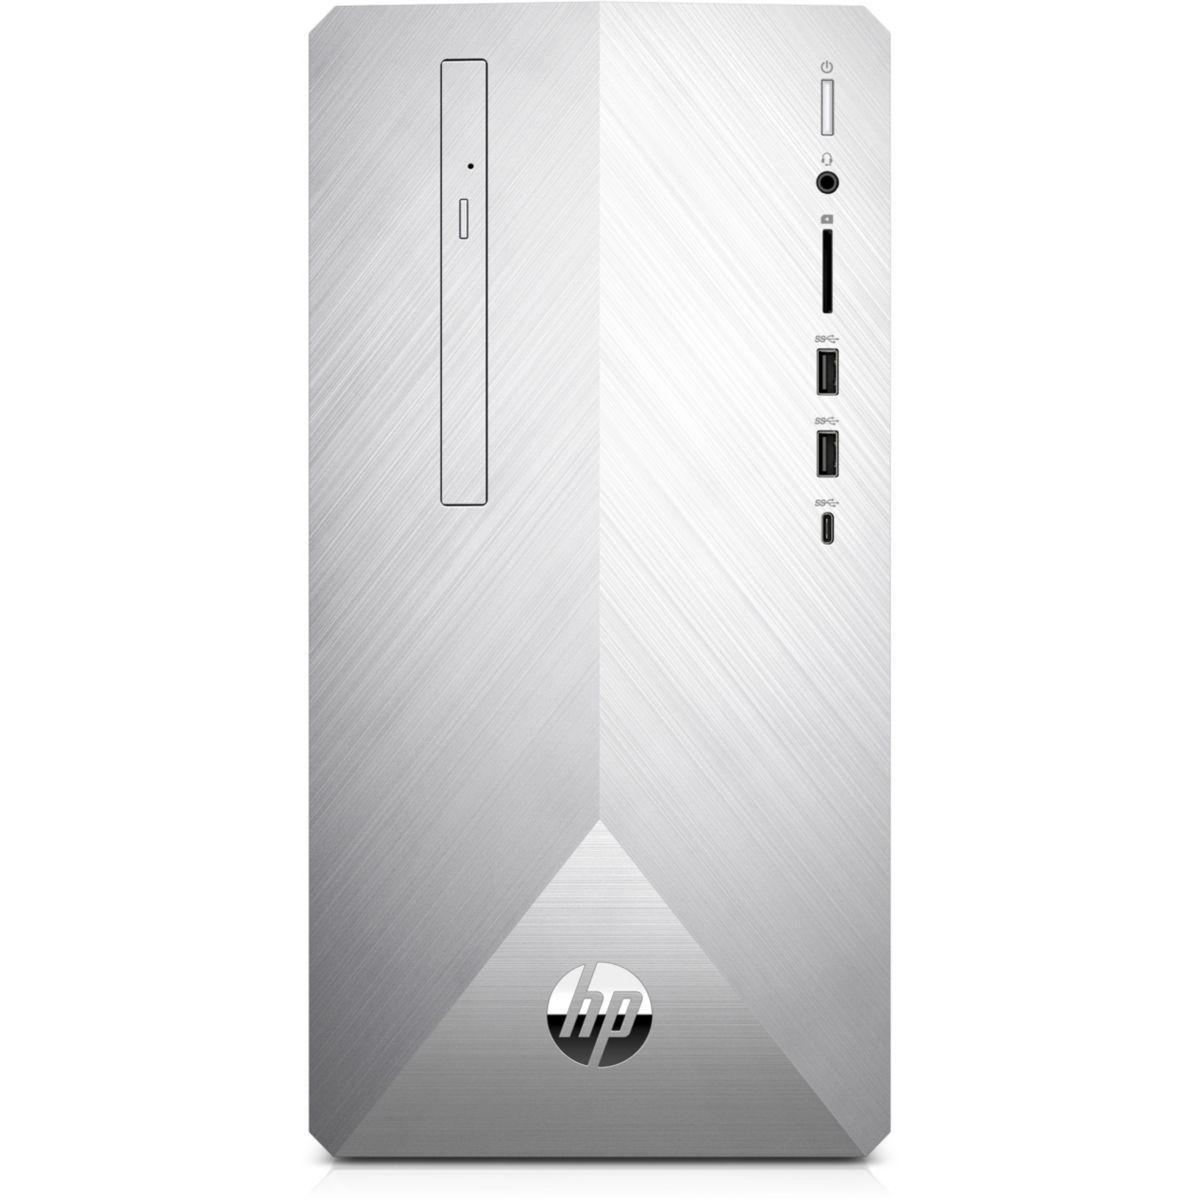 HP Pavilion 595 Core i5-8400 2.8 - HDD 1 TB - 8GB